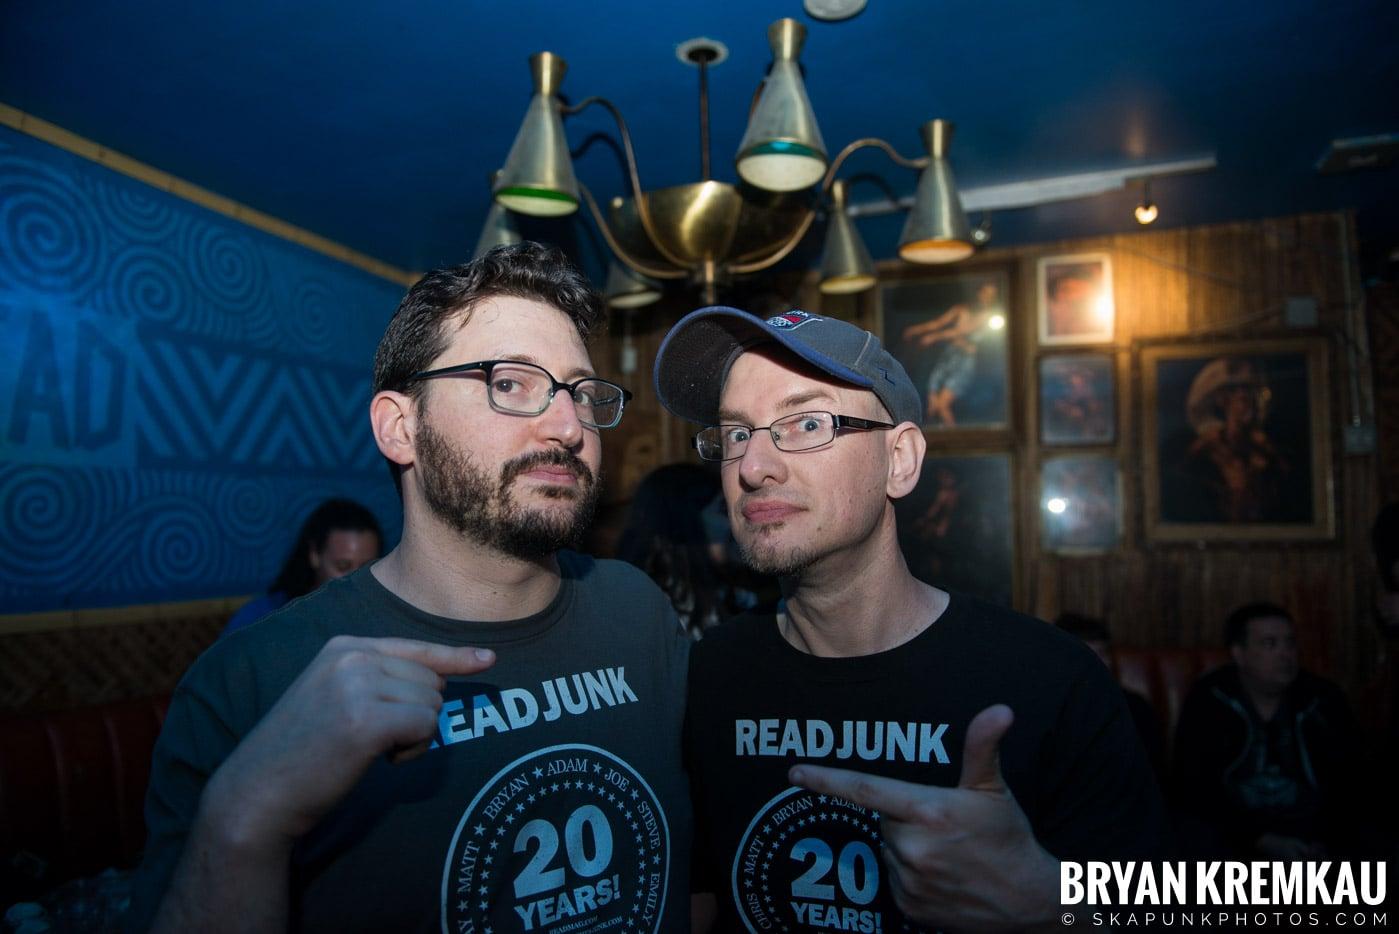 ReadJunk.com 20th Anniversary Party @ Otto's Shrunken Head, NYC - 4.29.17 (7)